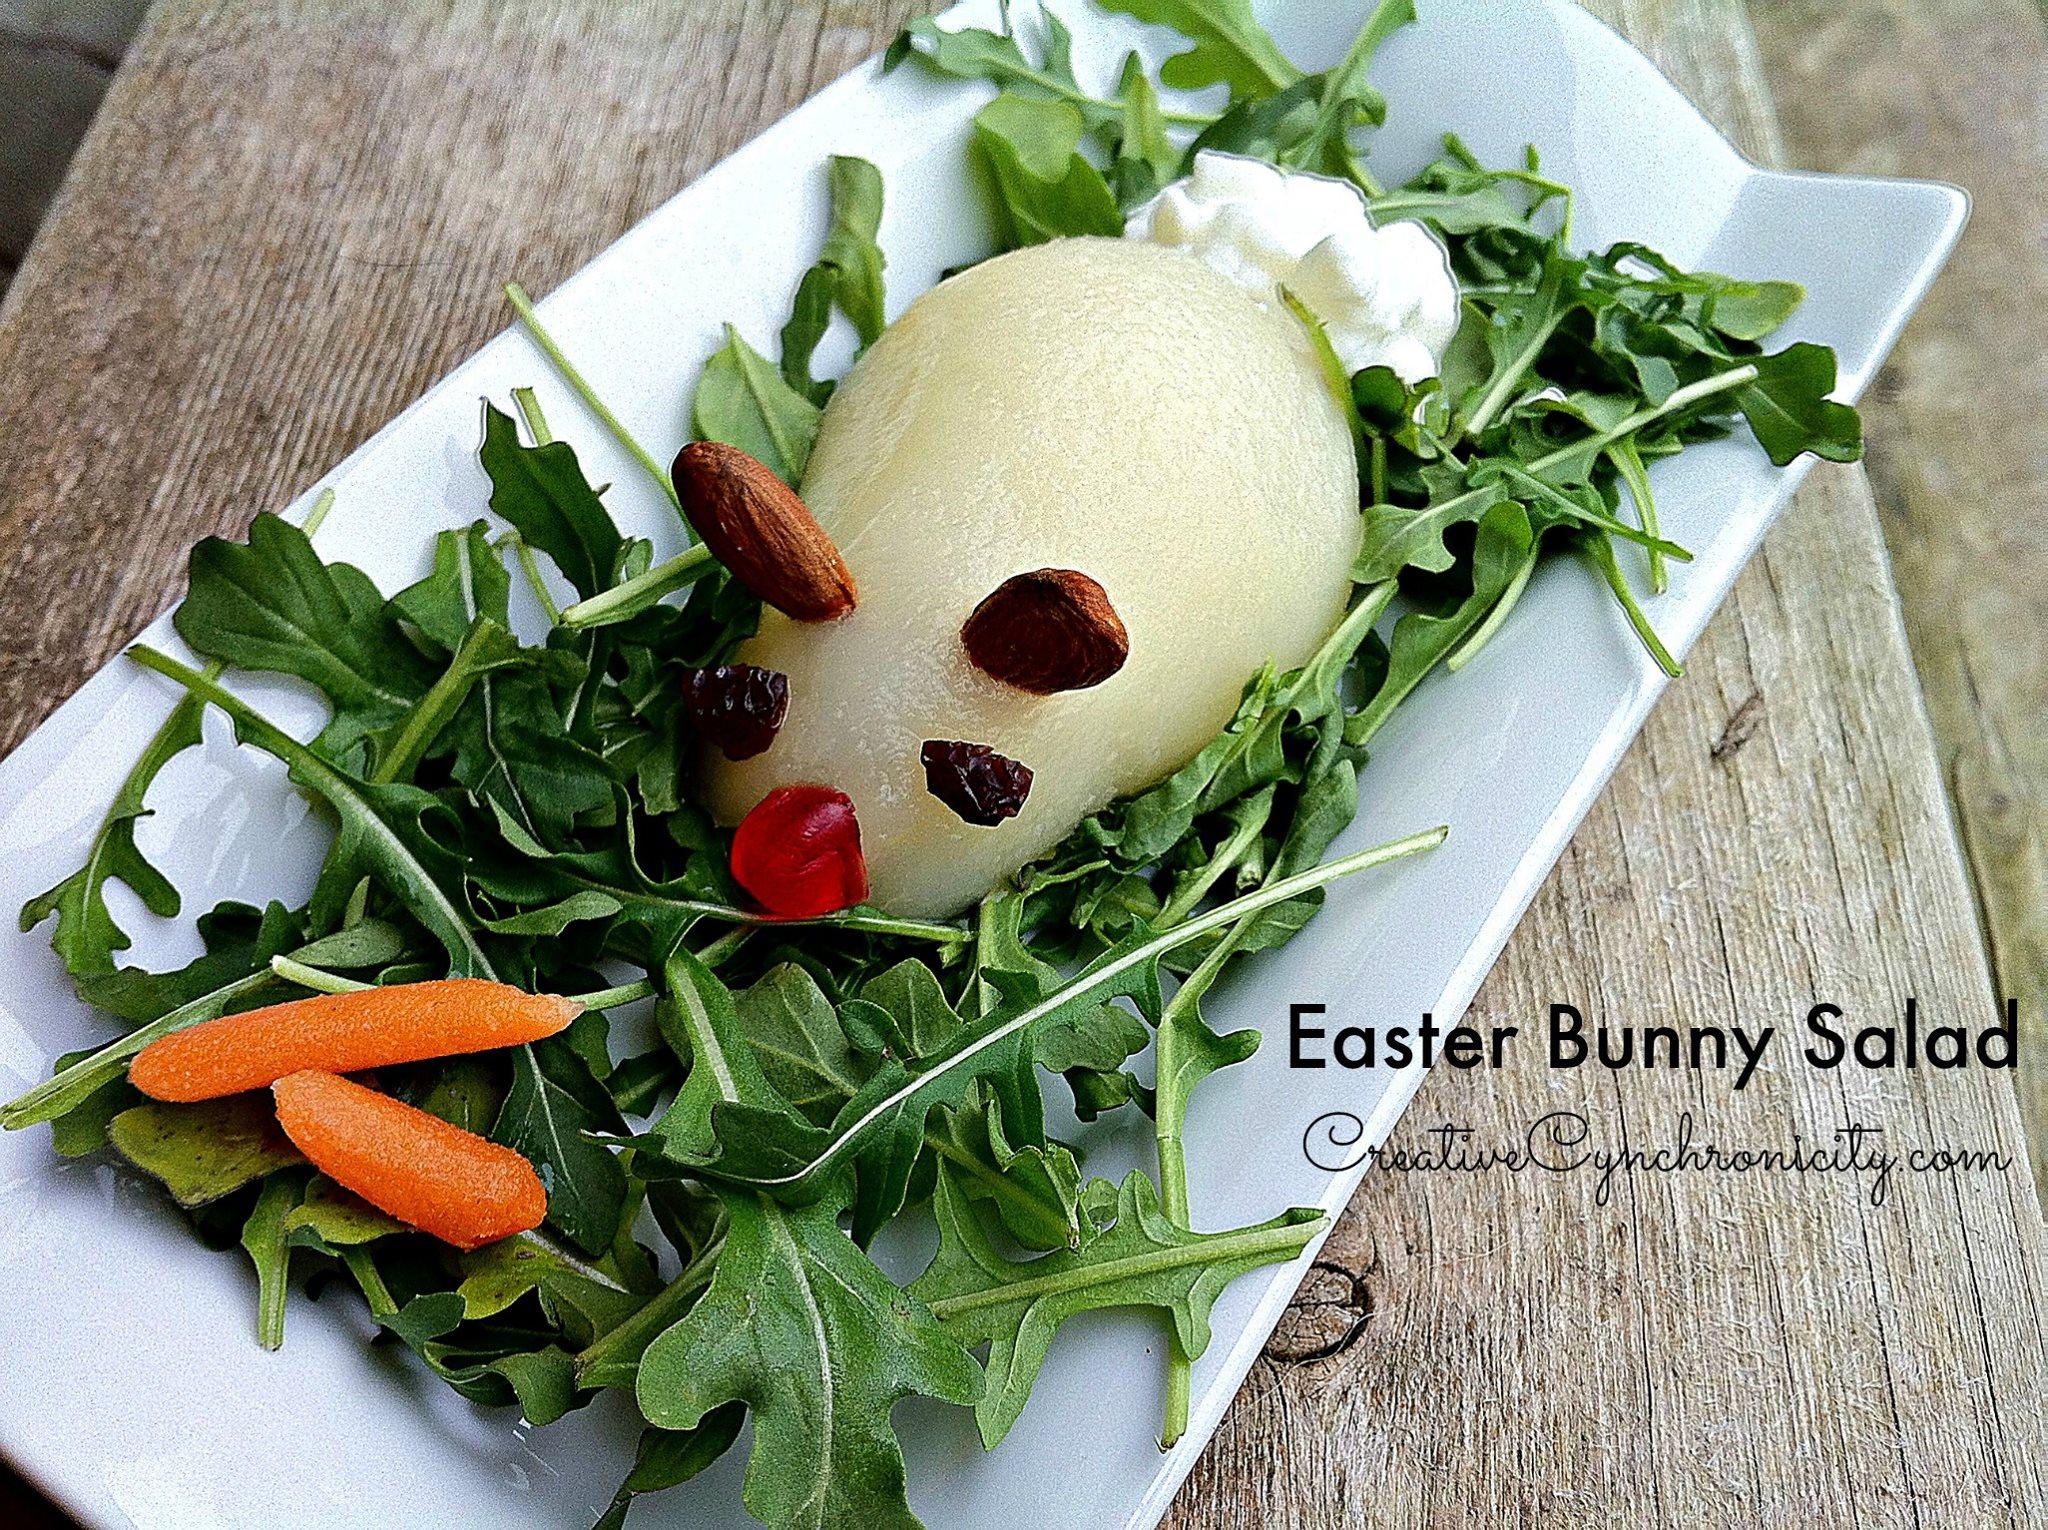 Easter Bunny Salad #12daysof